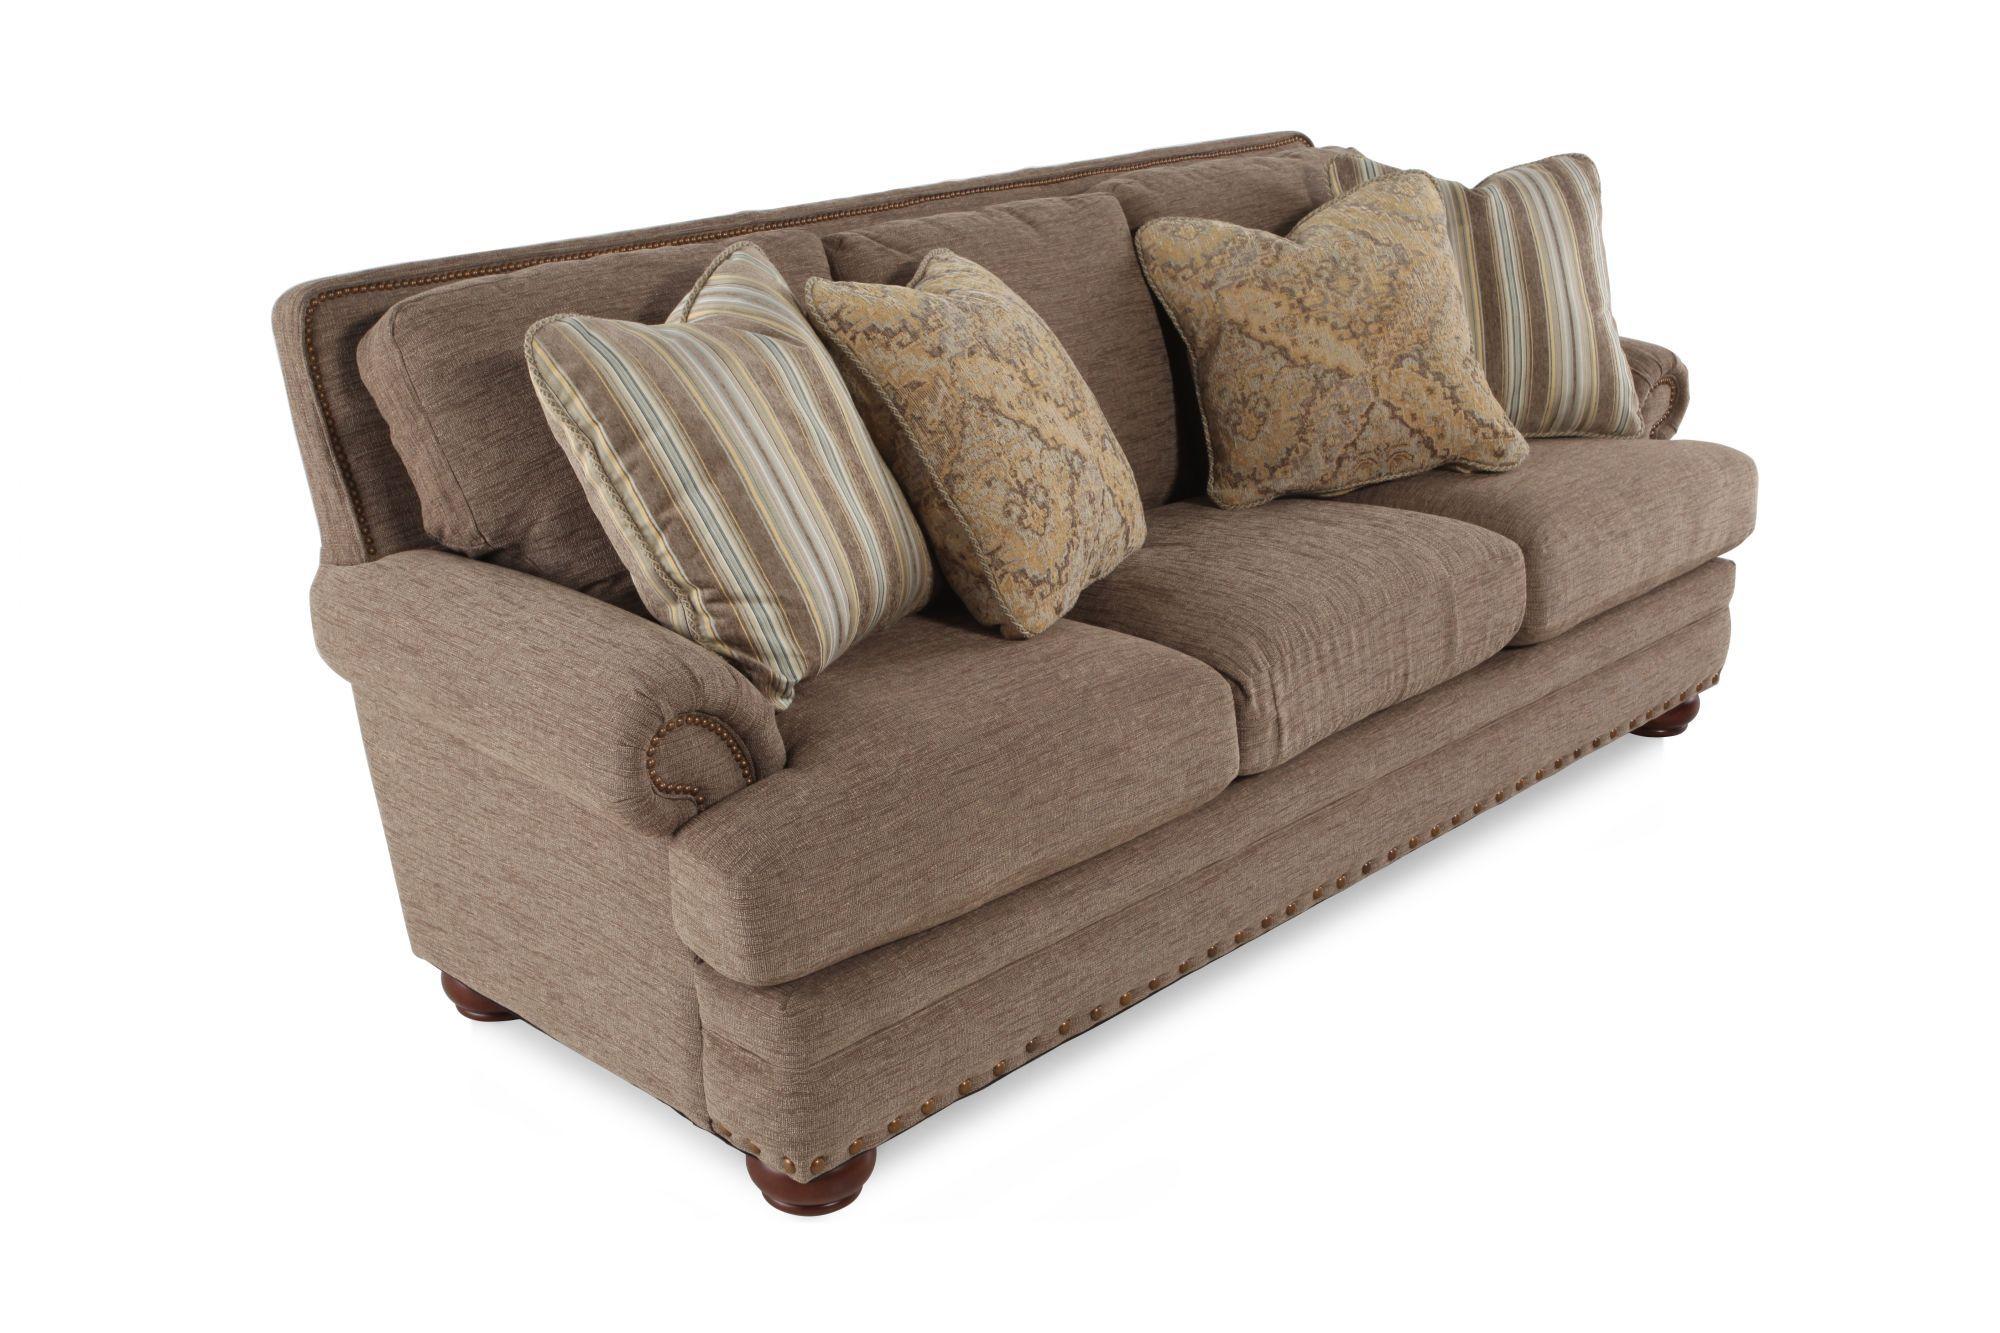 La Z Boy Brennan Bark Sofa   Furniture In 2018   Pinterest   Sofa Regarding Brennan Sofa Chairs (Image 19 of 25)